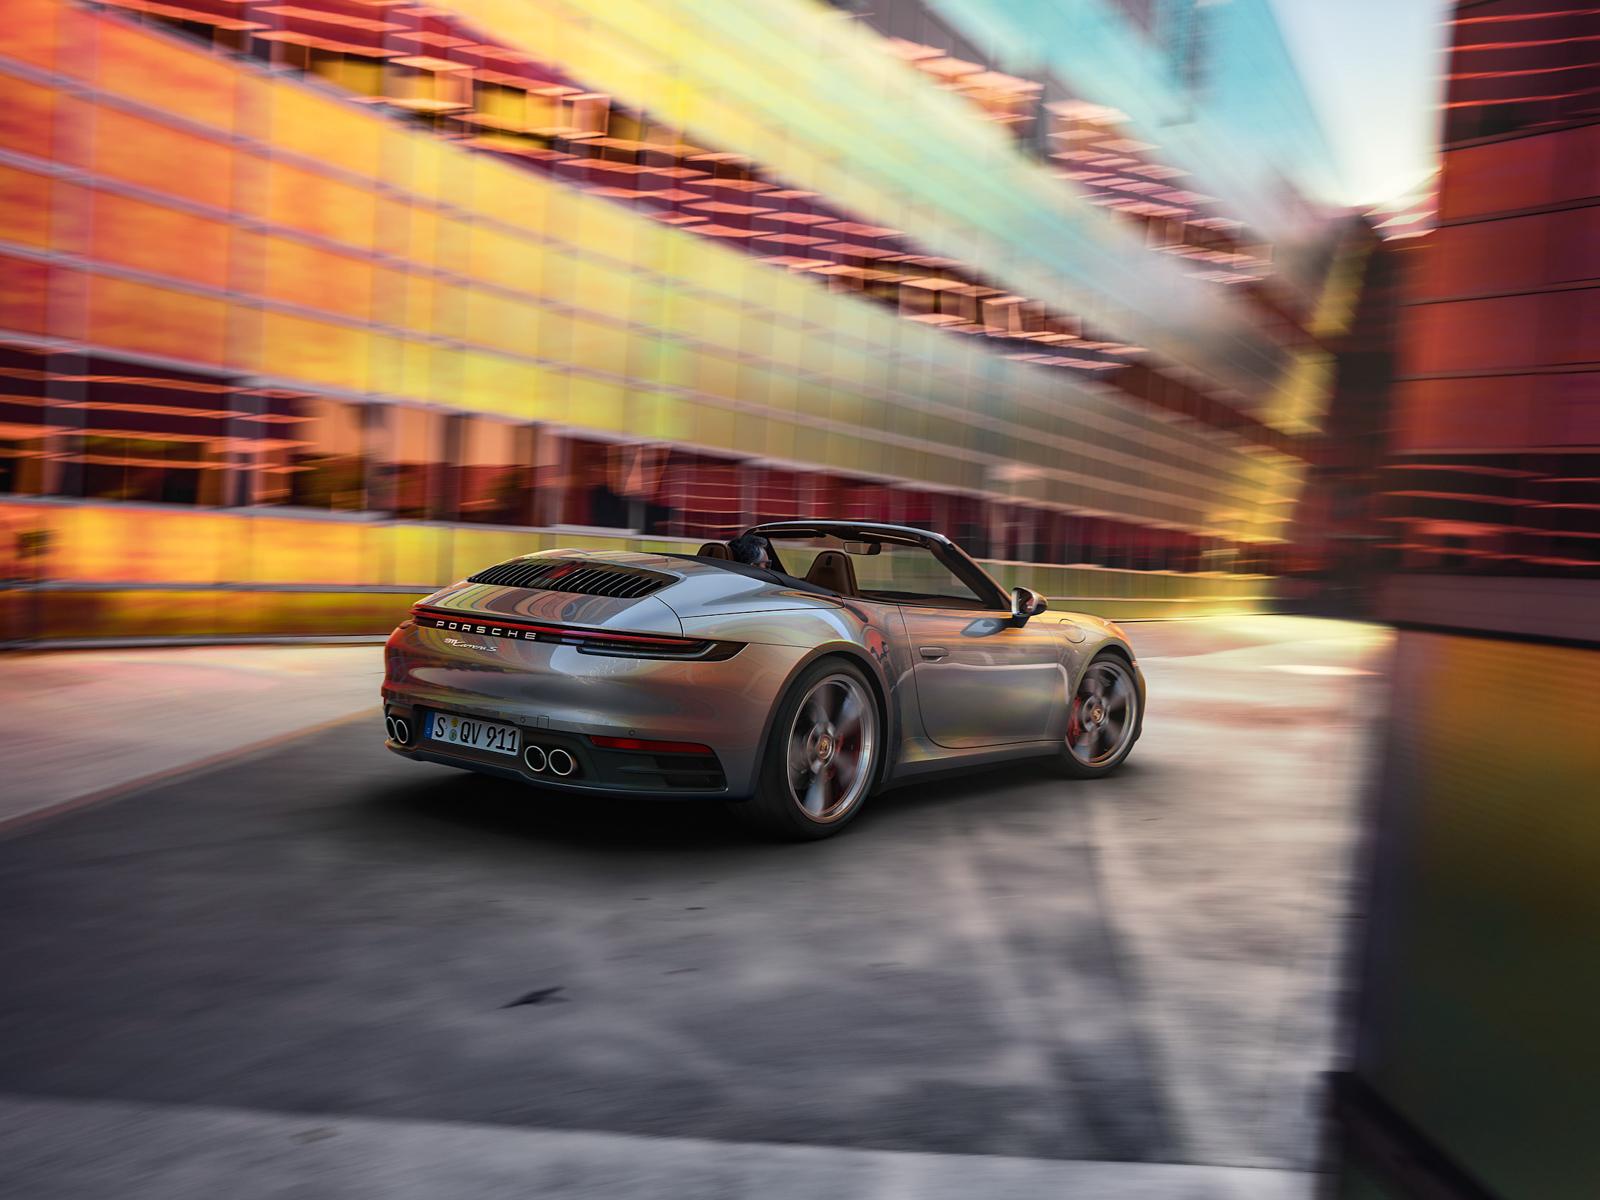 new porsche 911 cabriolet unveiled ferdinand. Black Bedroom Furniture Sets. Home Design Ideas